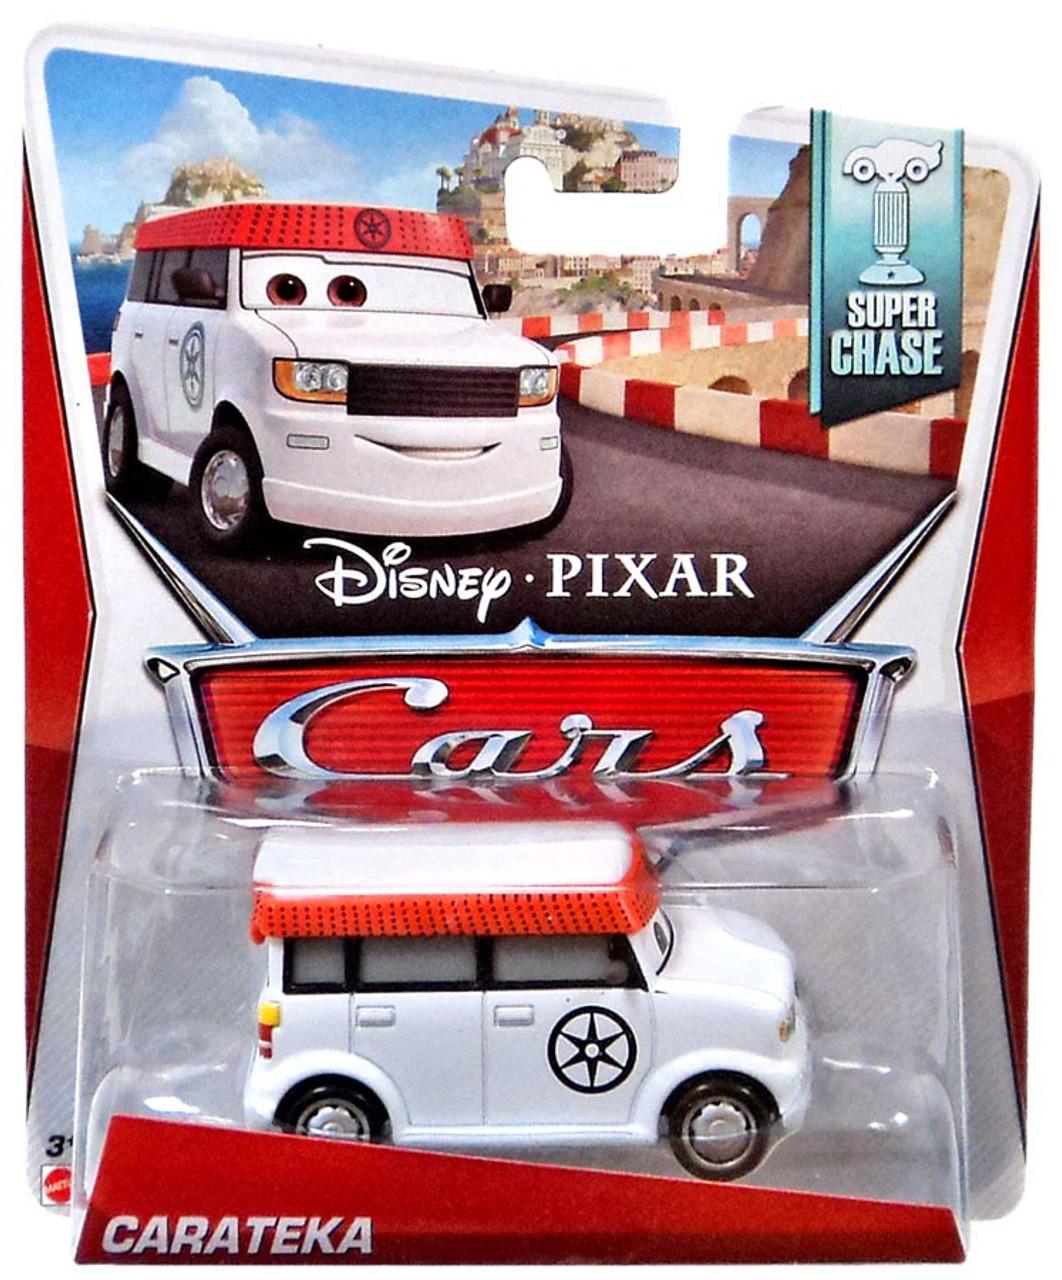 Car Toys Product : Disney cars super chase carateka diecast car mattel